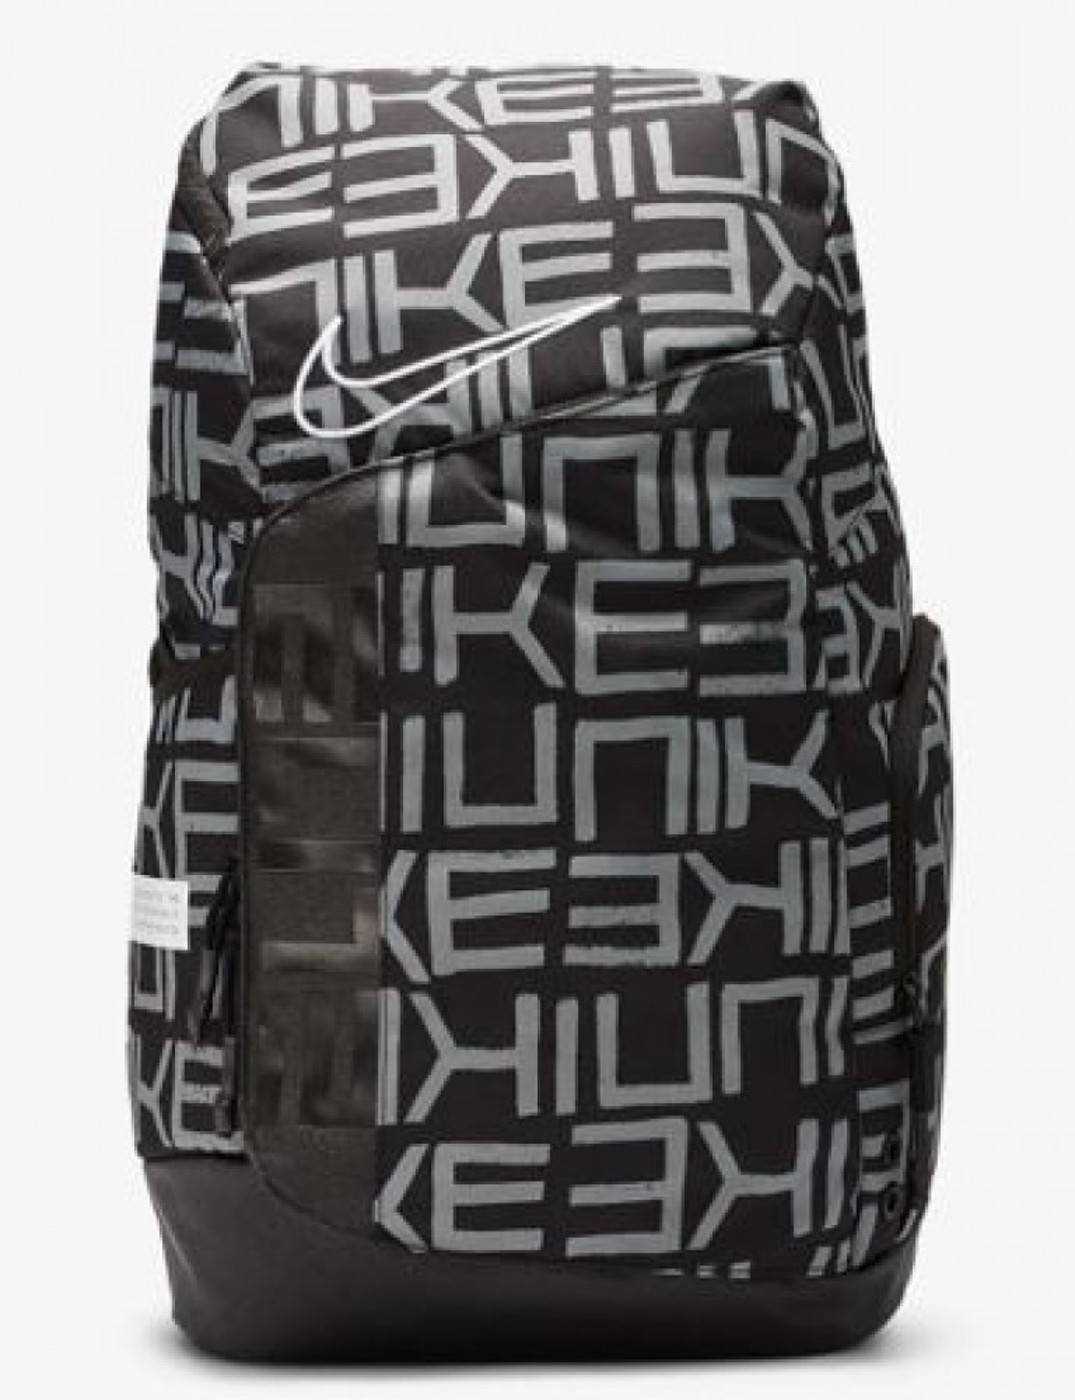 Nike Elite Pro Printed Basketb